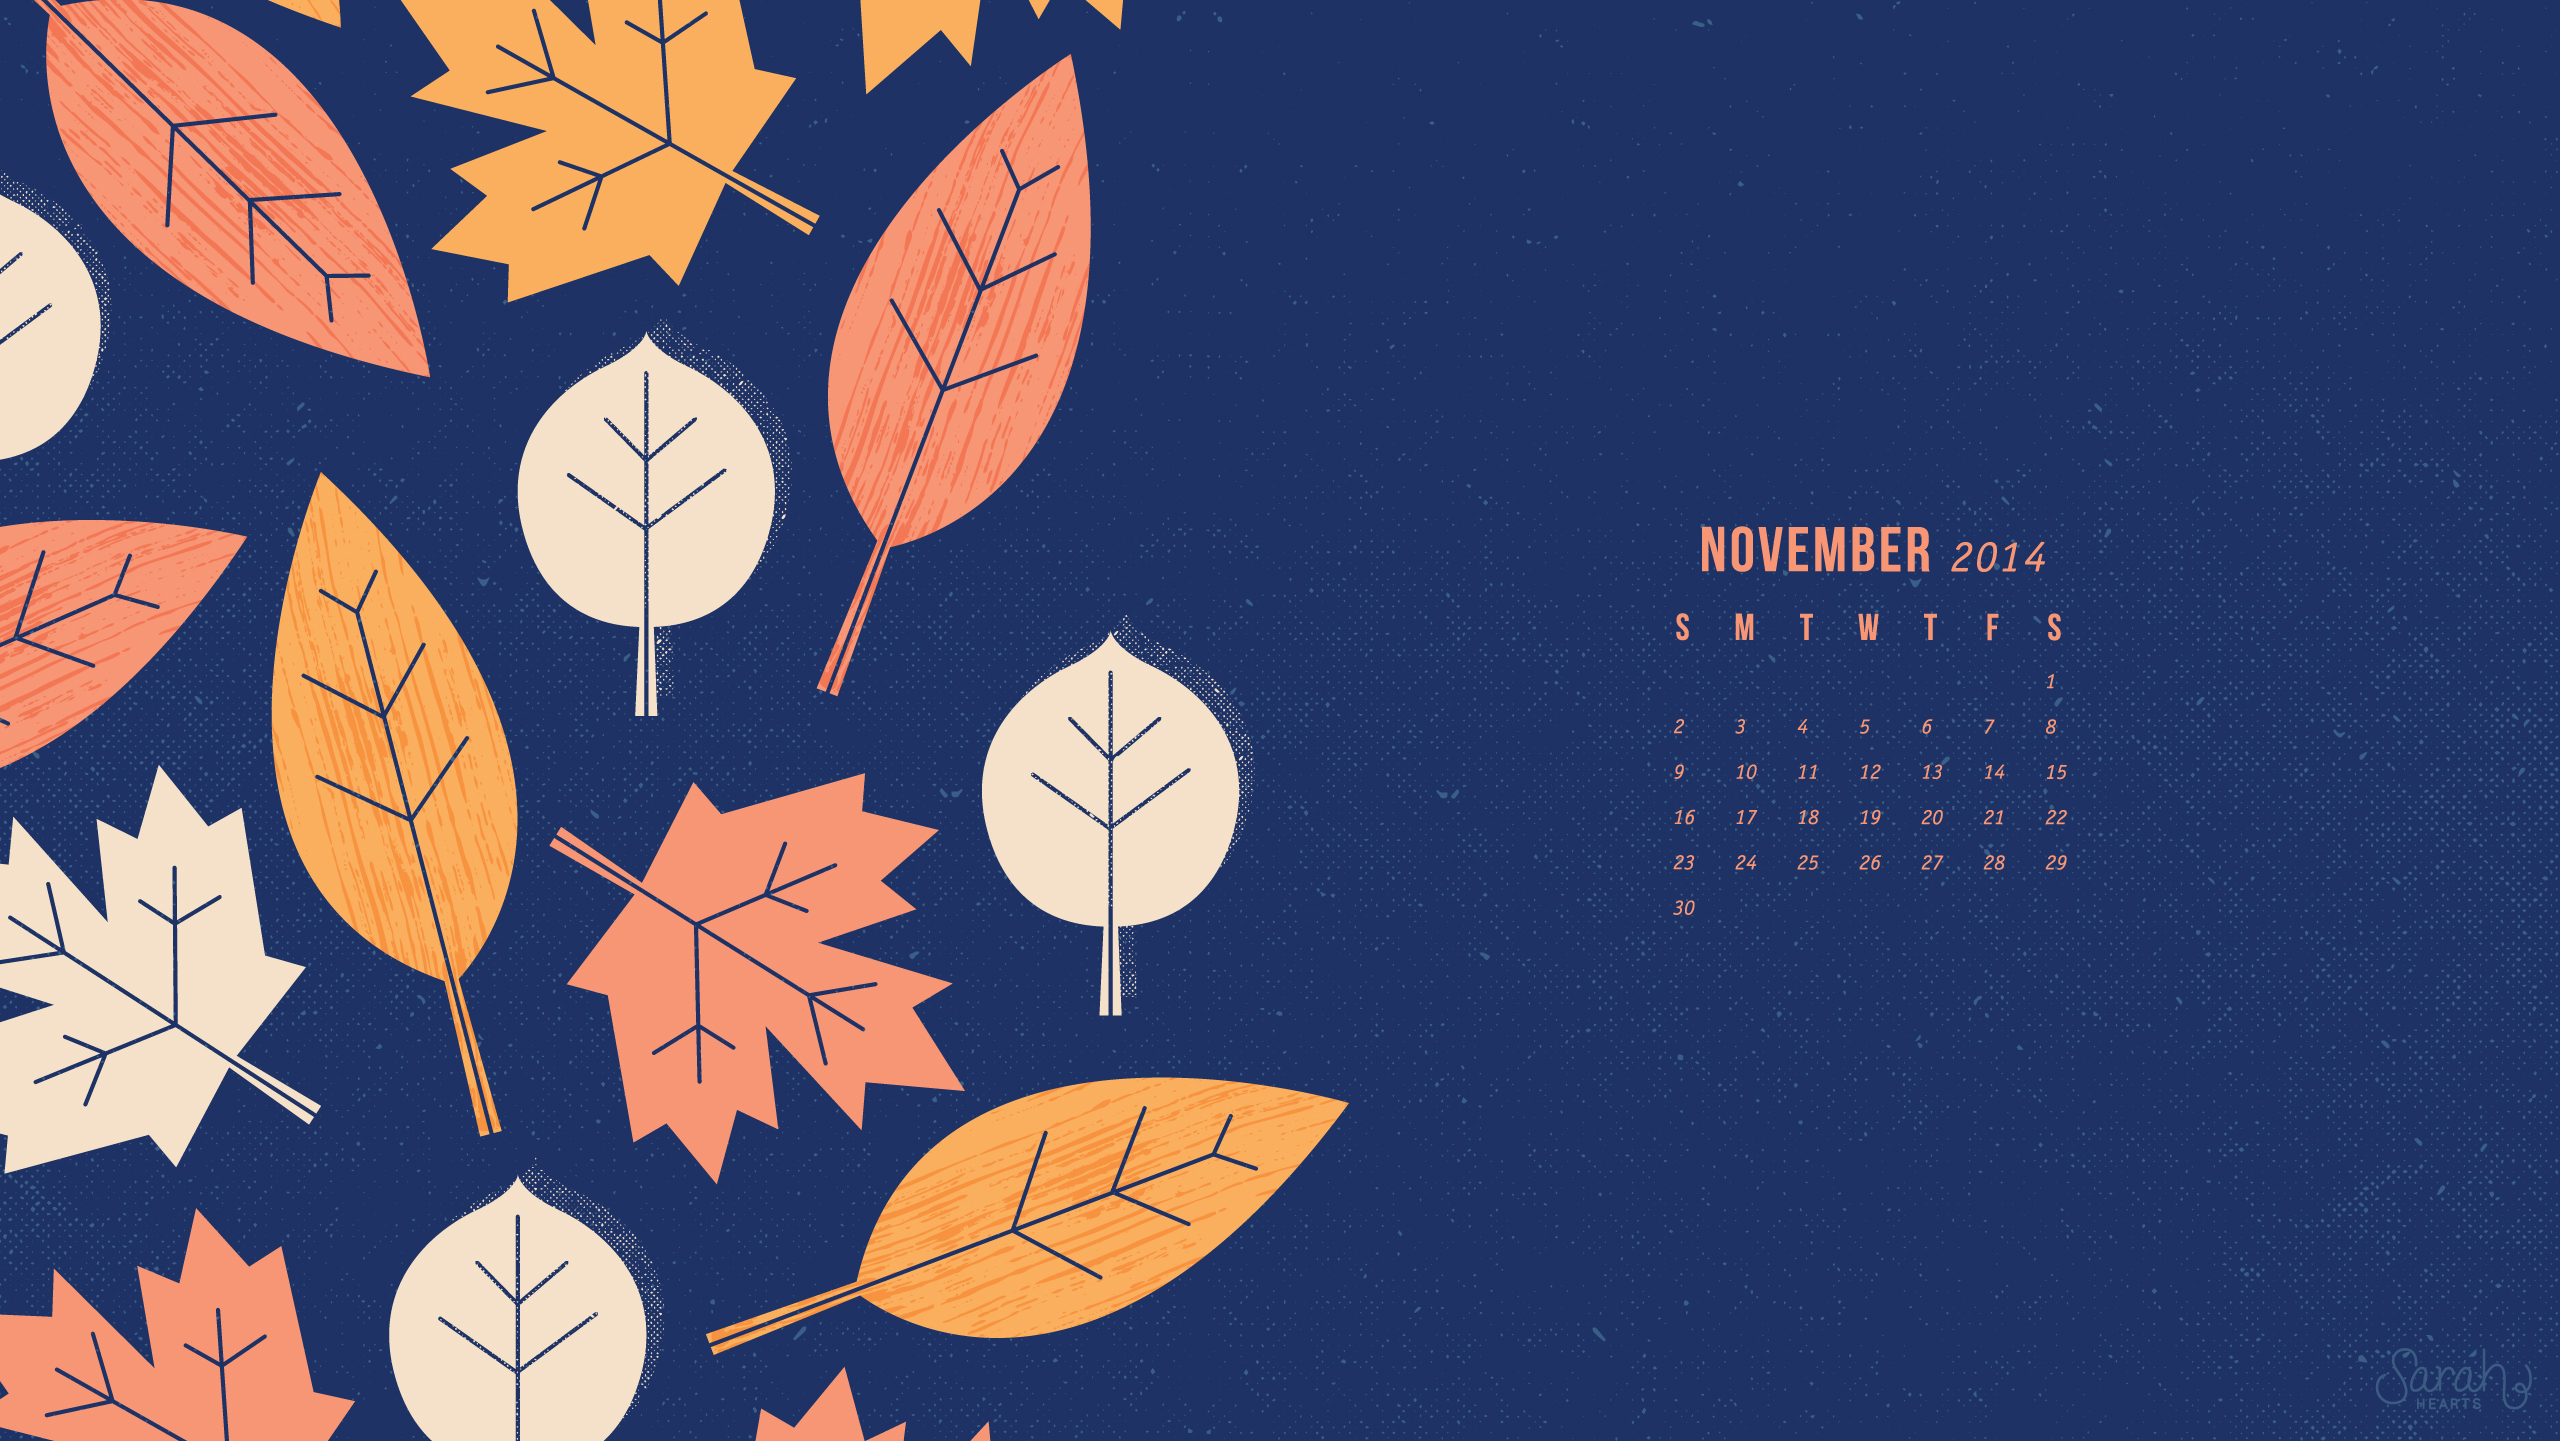 November Fall Wallpaper November 2014 Calendar Wallpapers Sarah Hearts